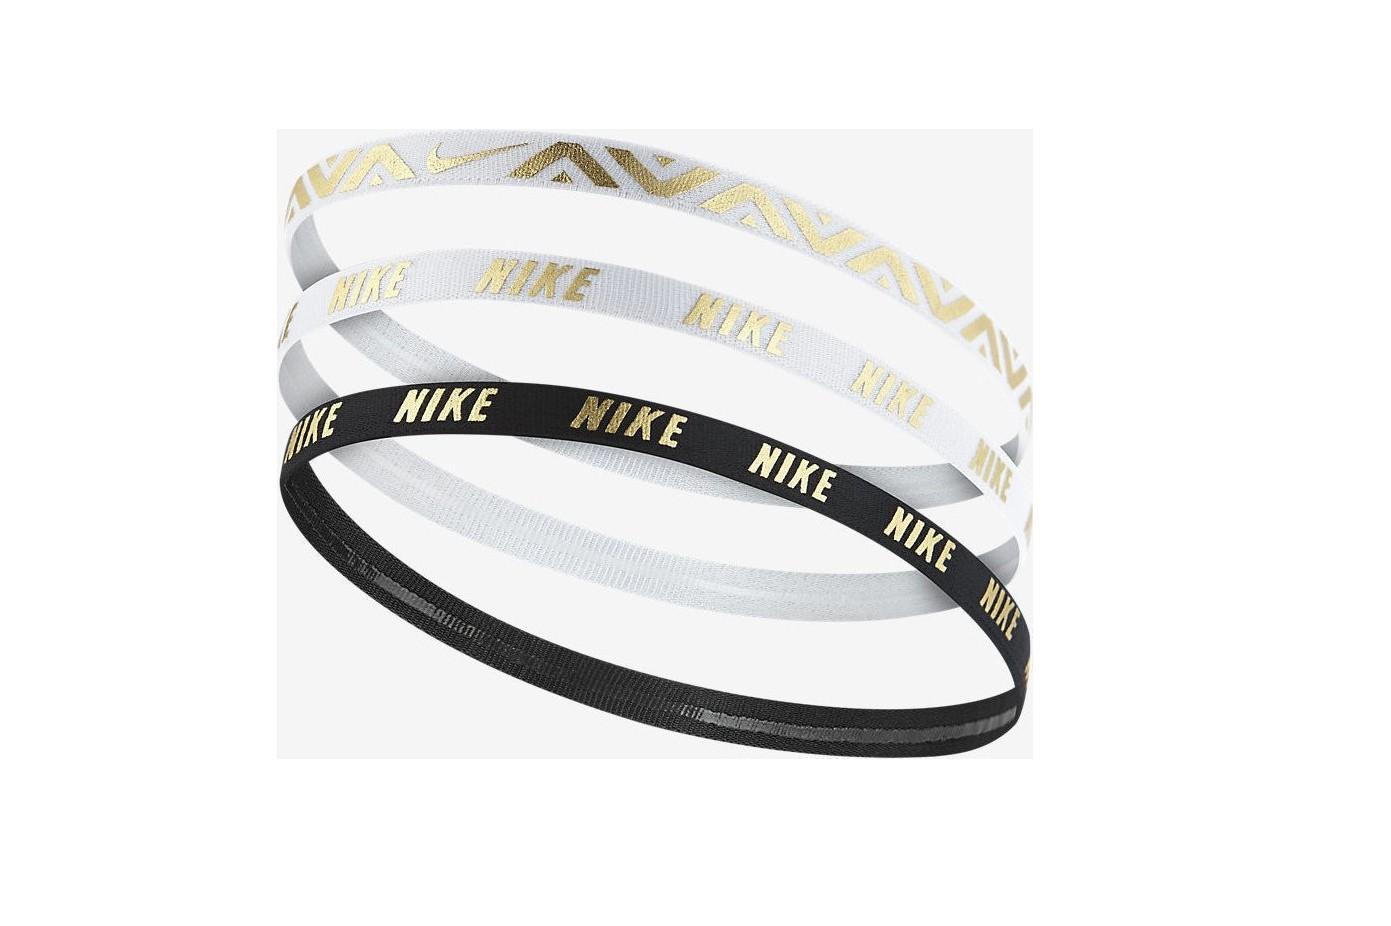 Dámská čelenka Nike METALLIC HAIRBANDS 3 PACK  127df070b0